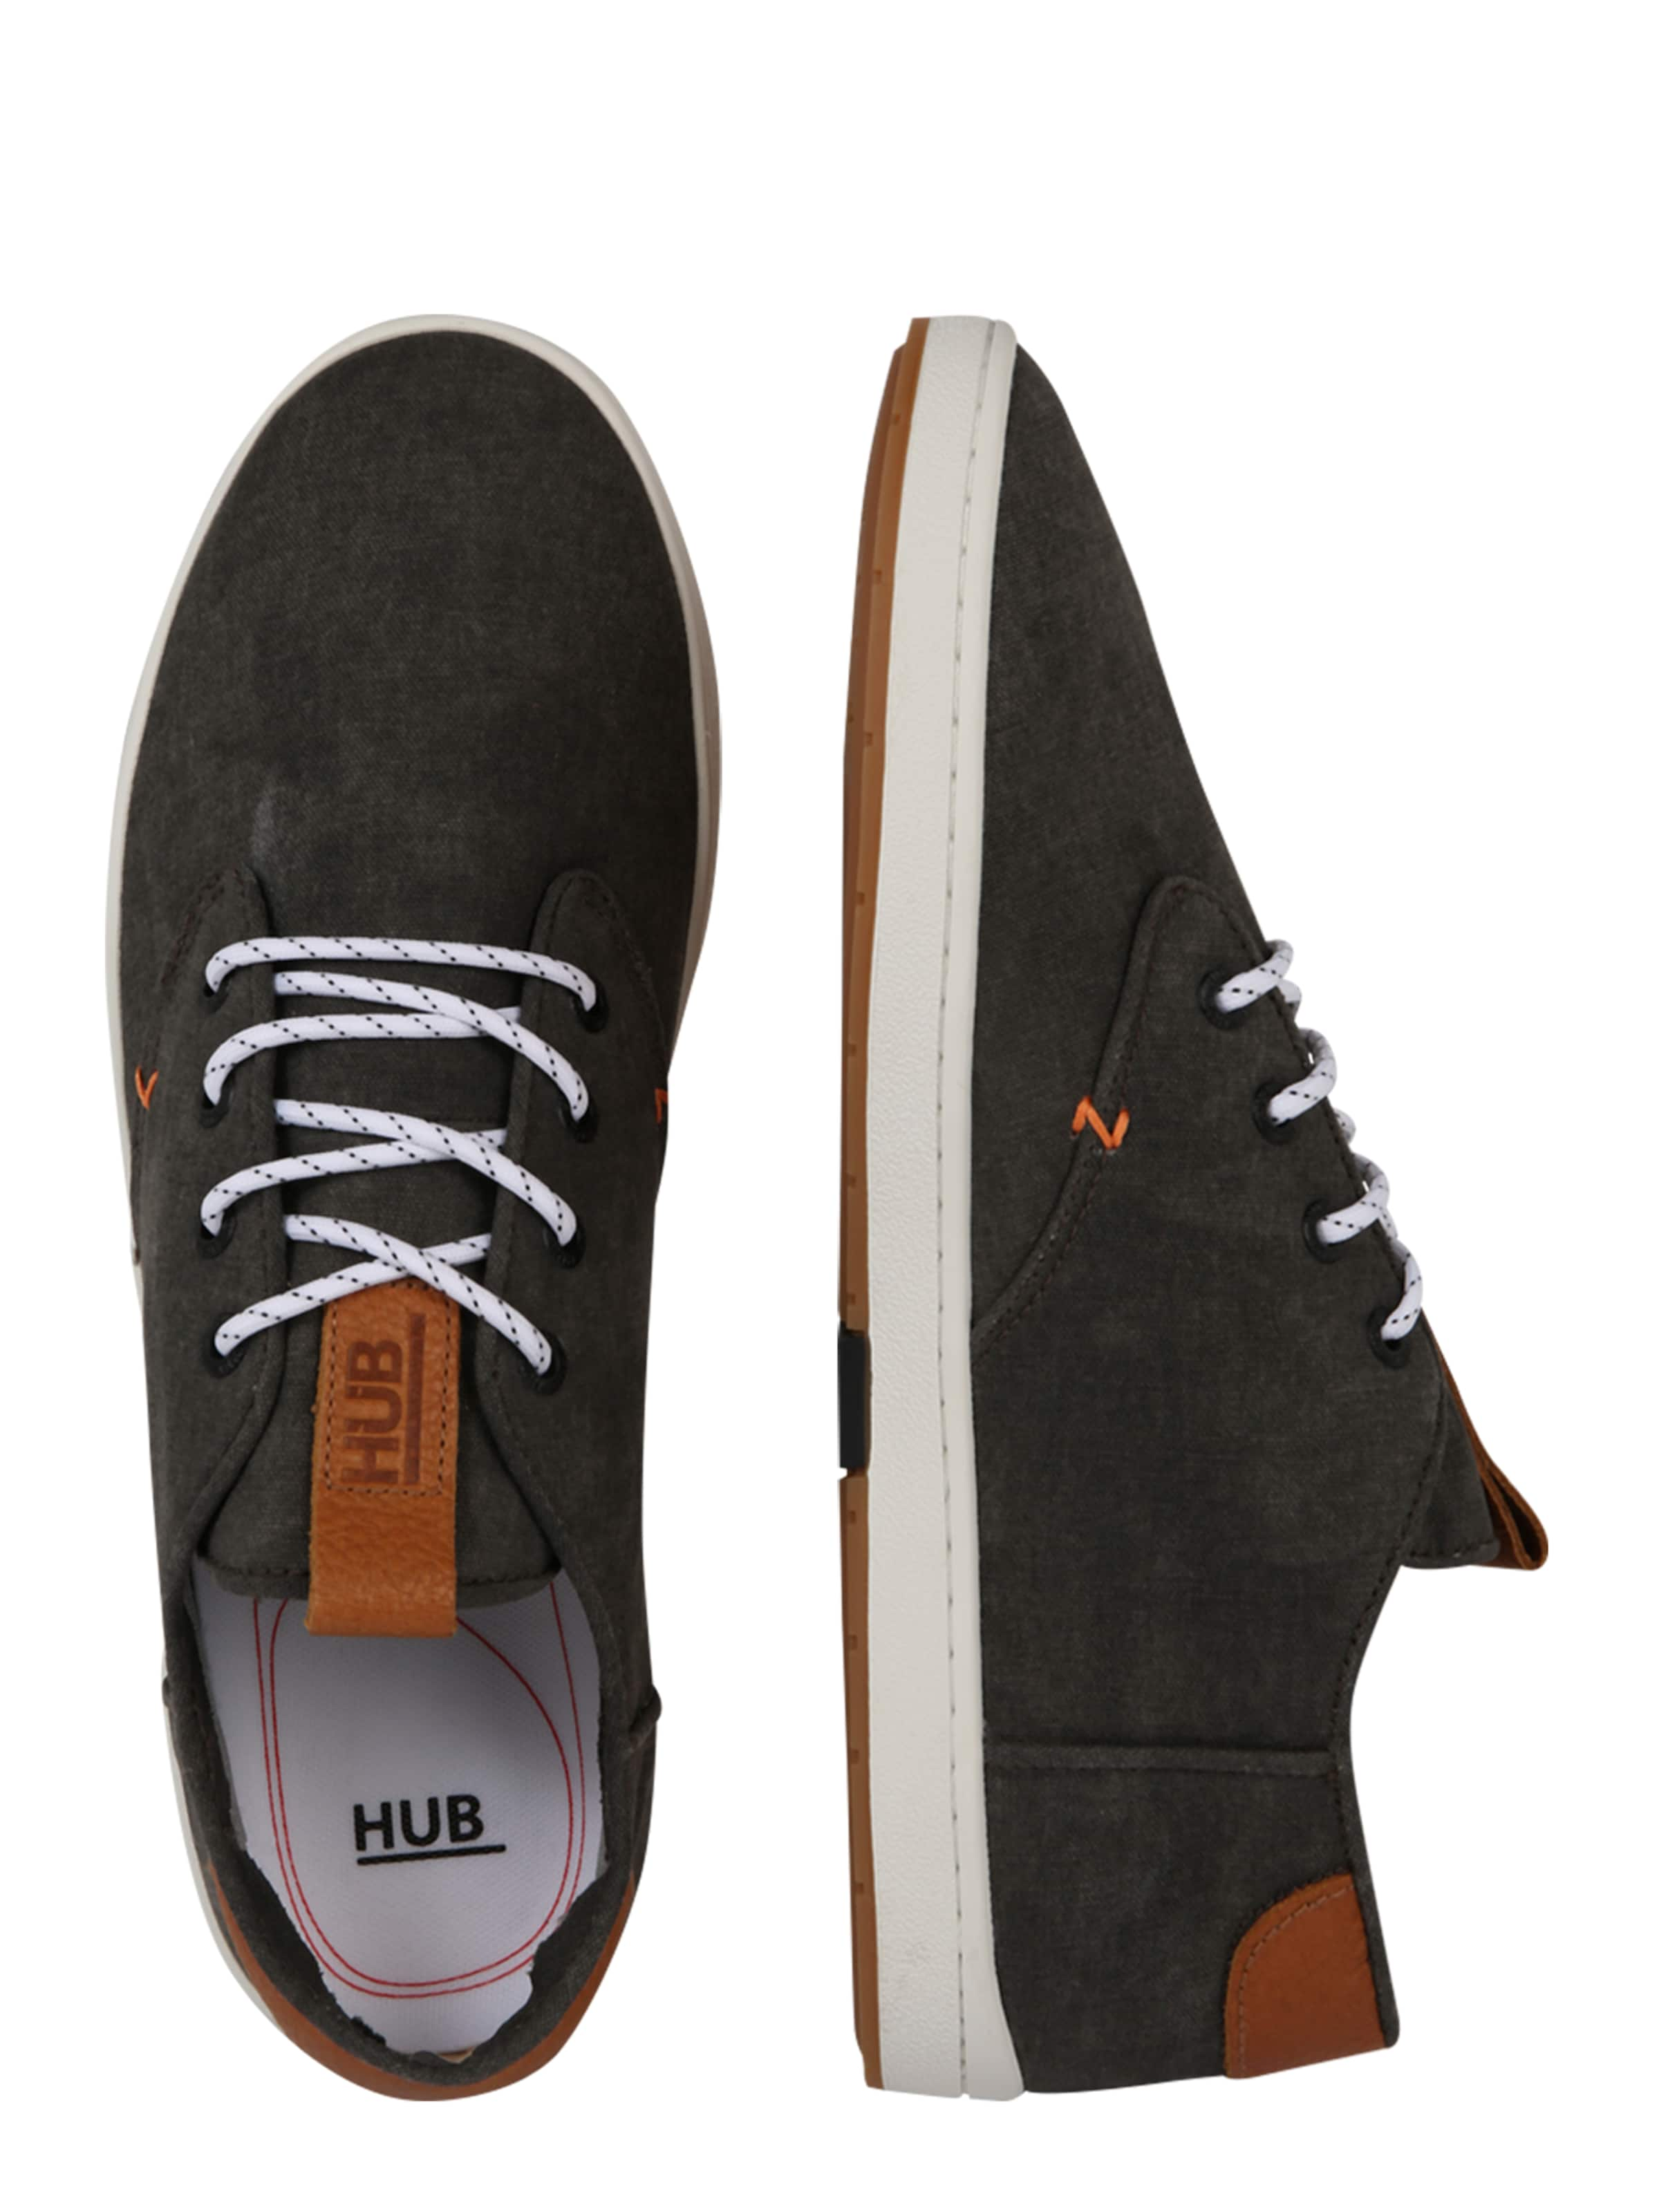 Hub Sneaker 2 SchwarzOffwhite 'chucker 0' In NywvnO0m8